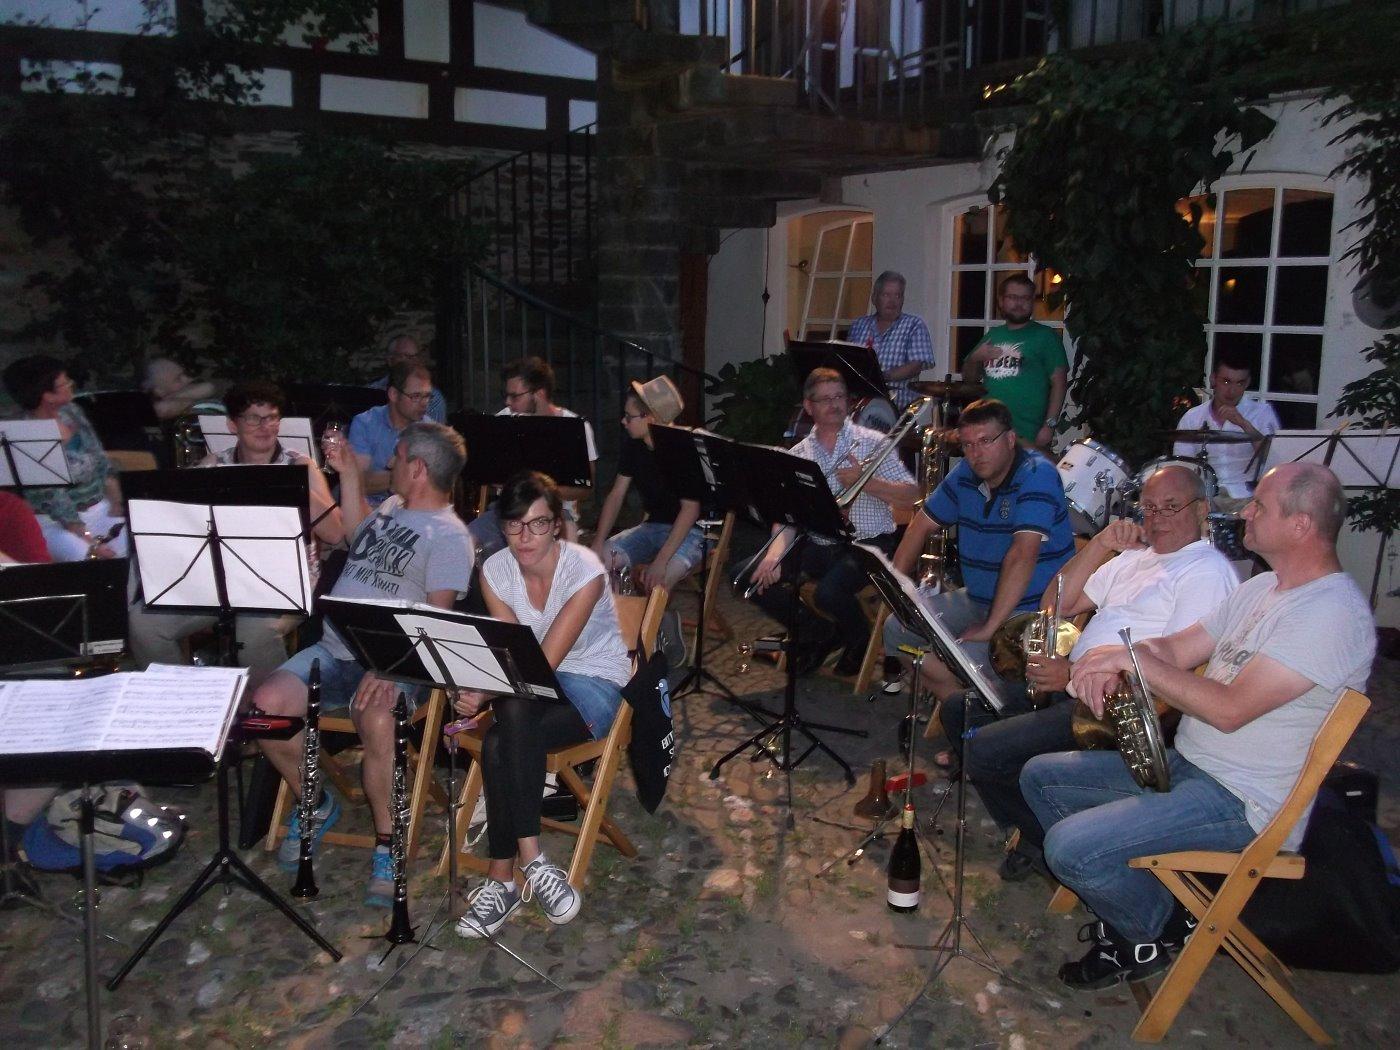 2017 - Enkircher Feierabend im Weingut Rueff-Röchling